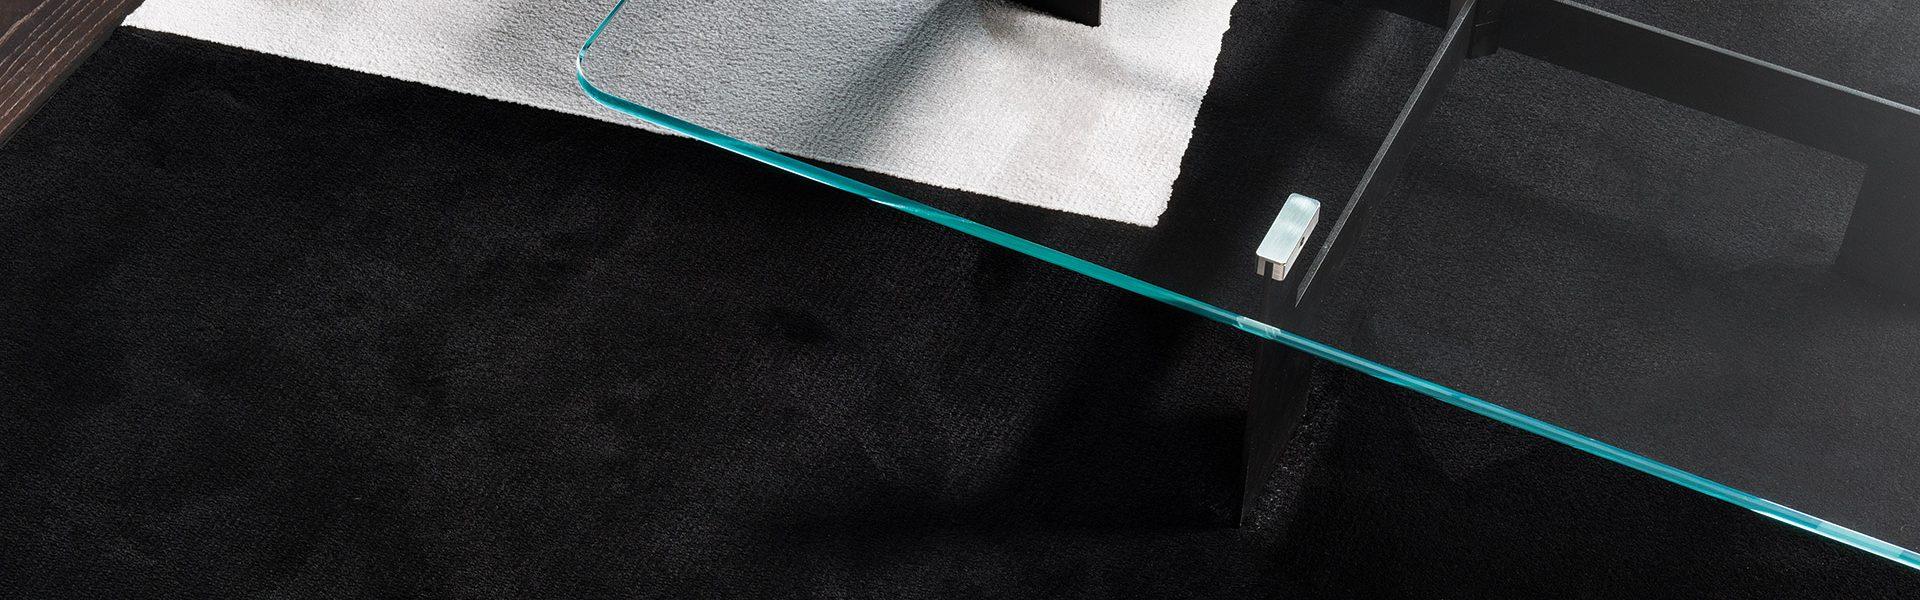 Dibbets Diagonal Rug